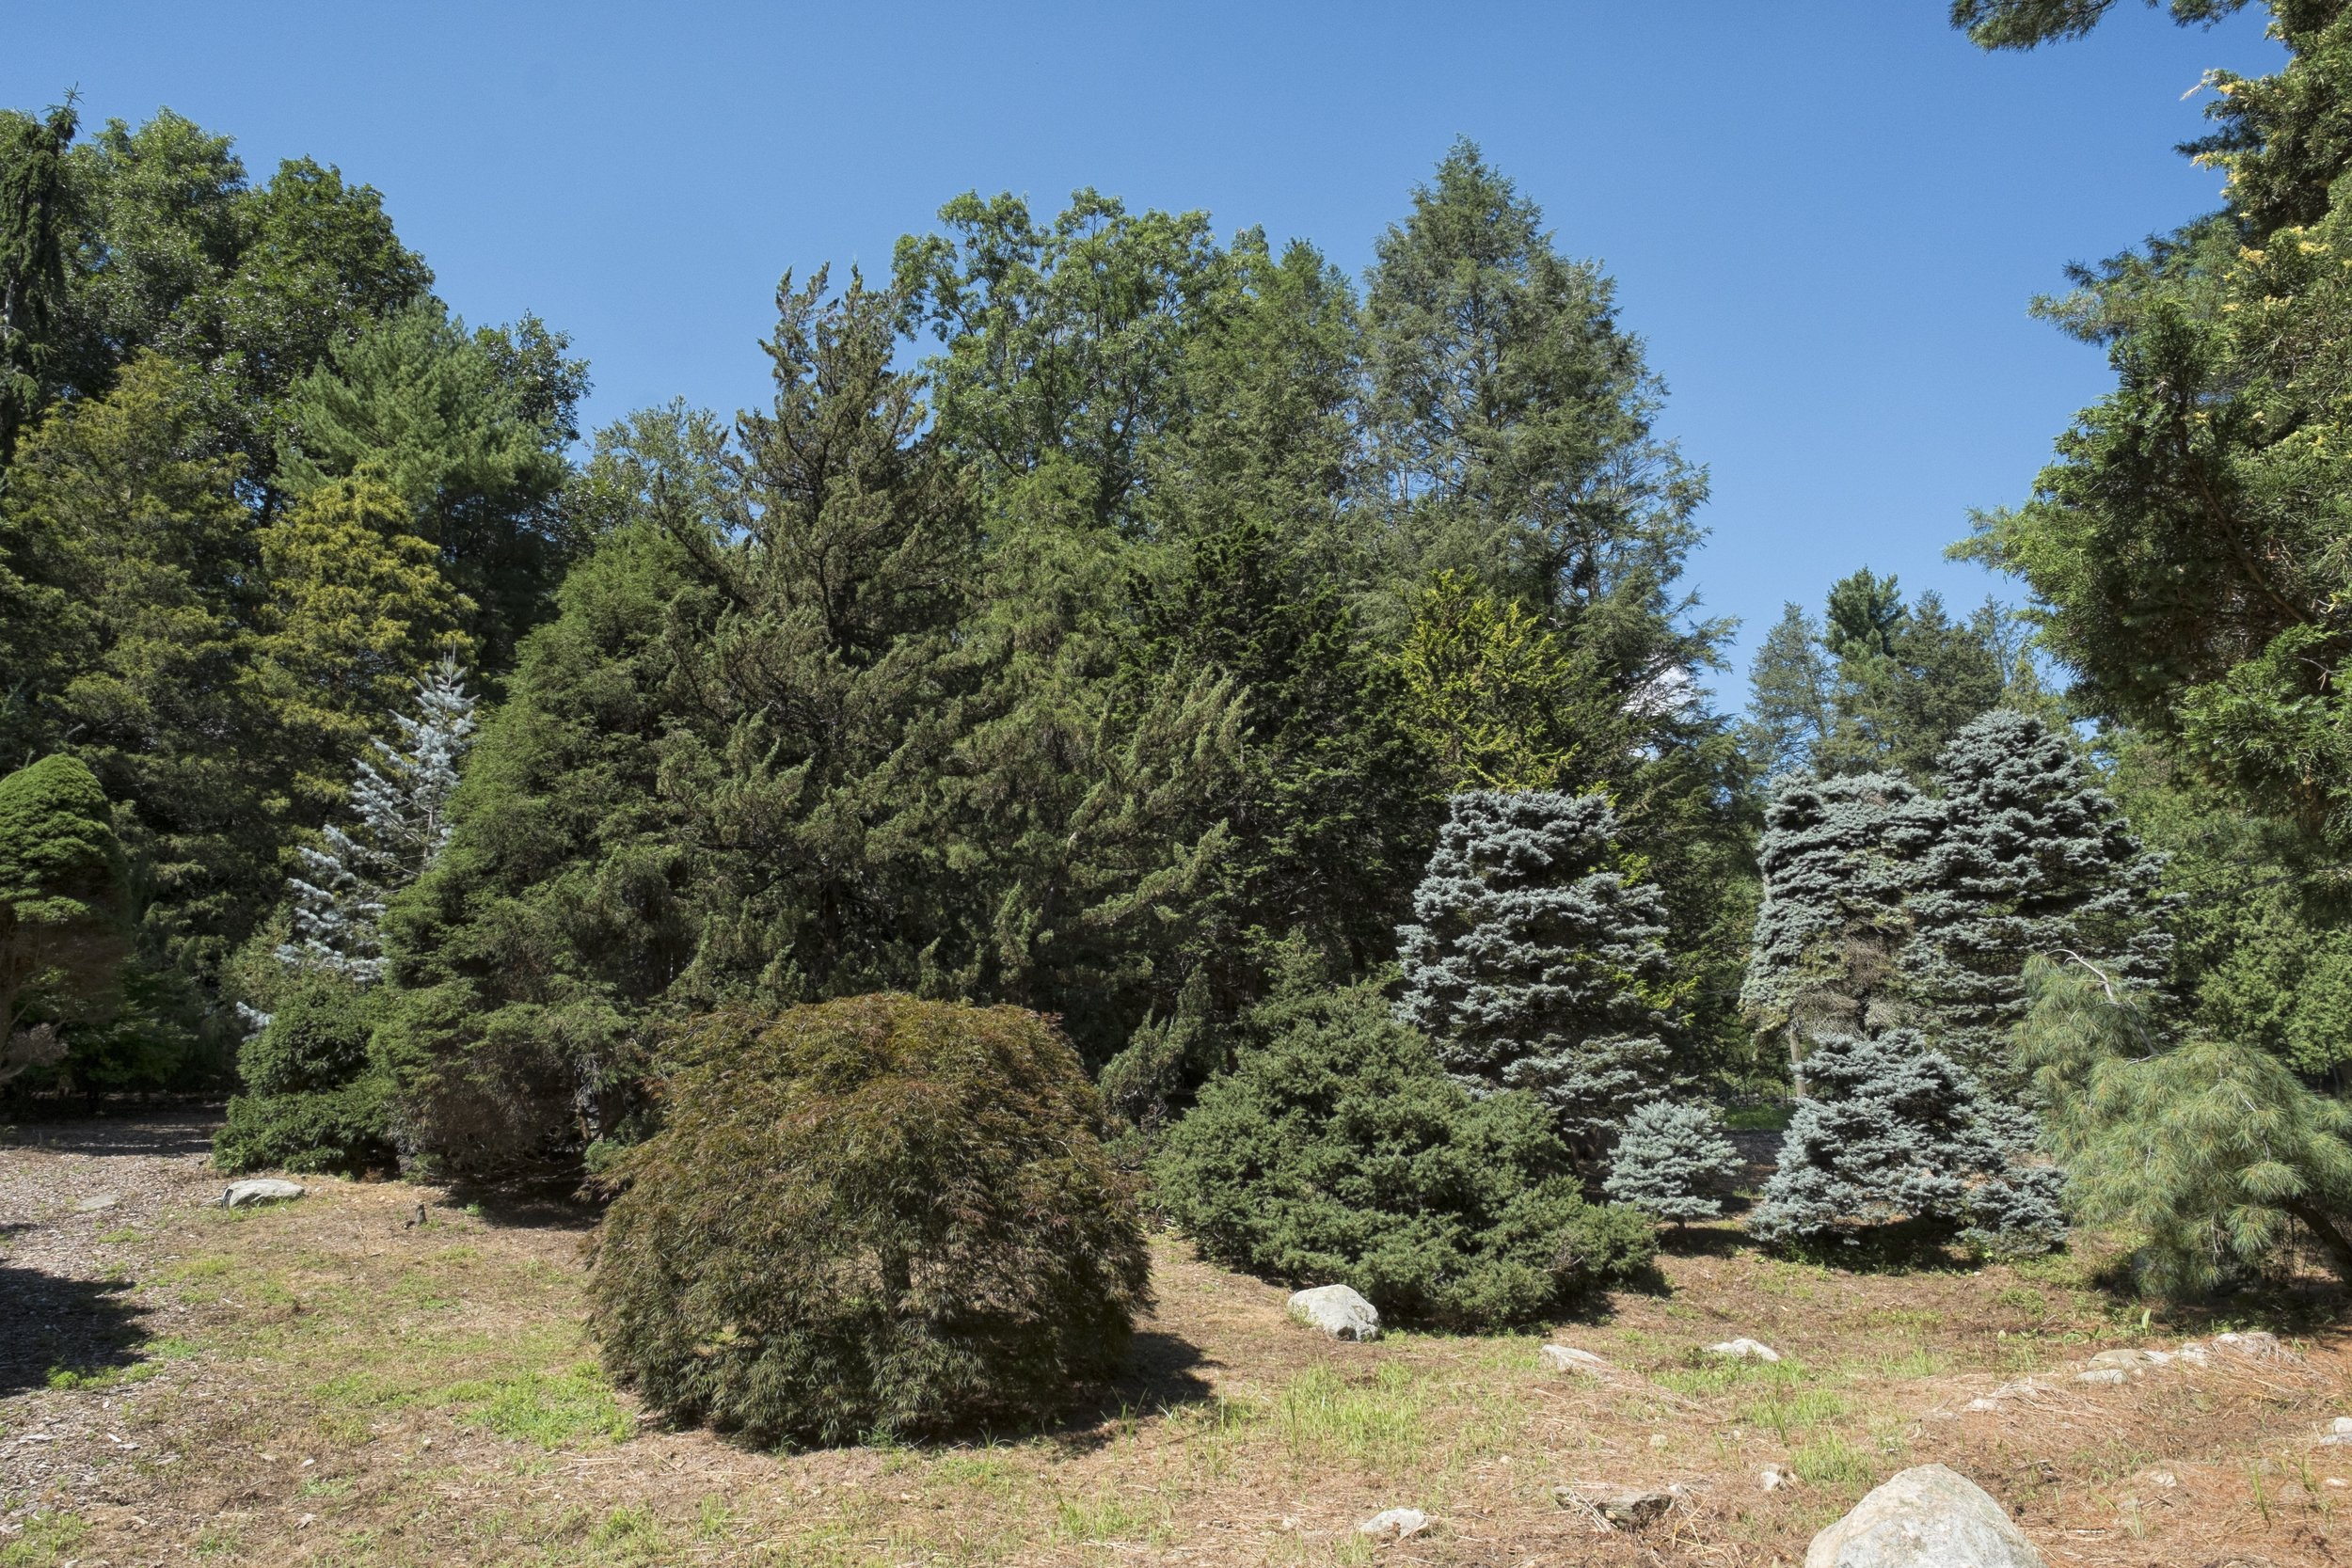 Conifer6.jpg